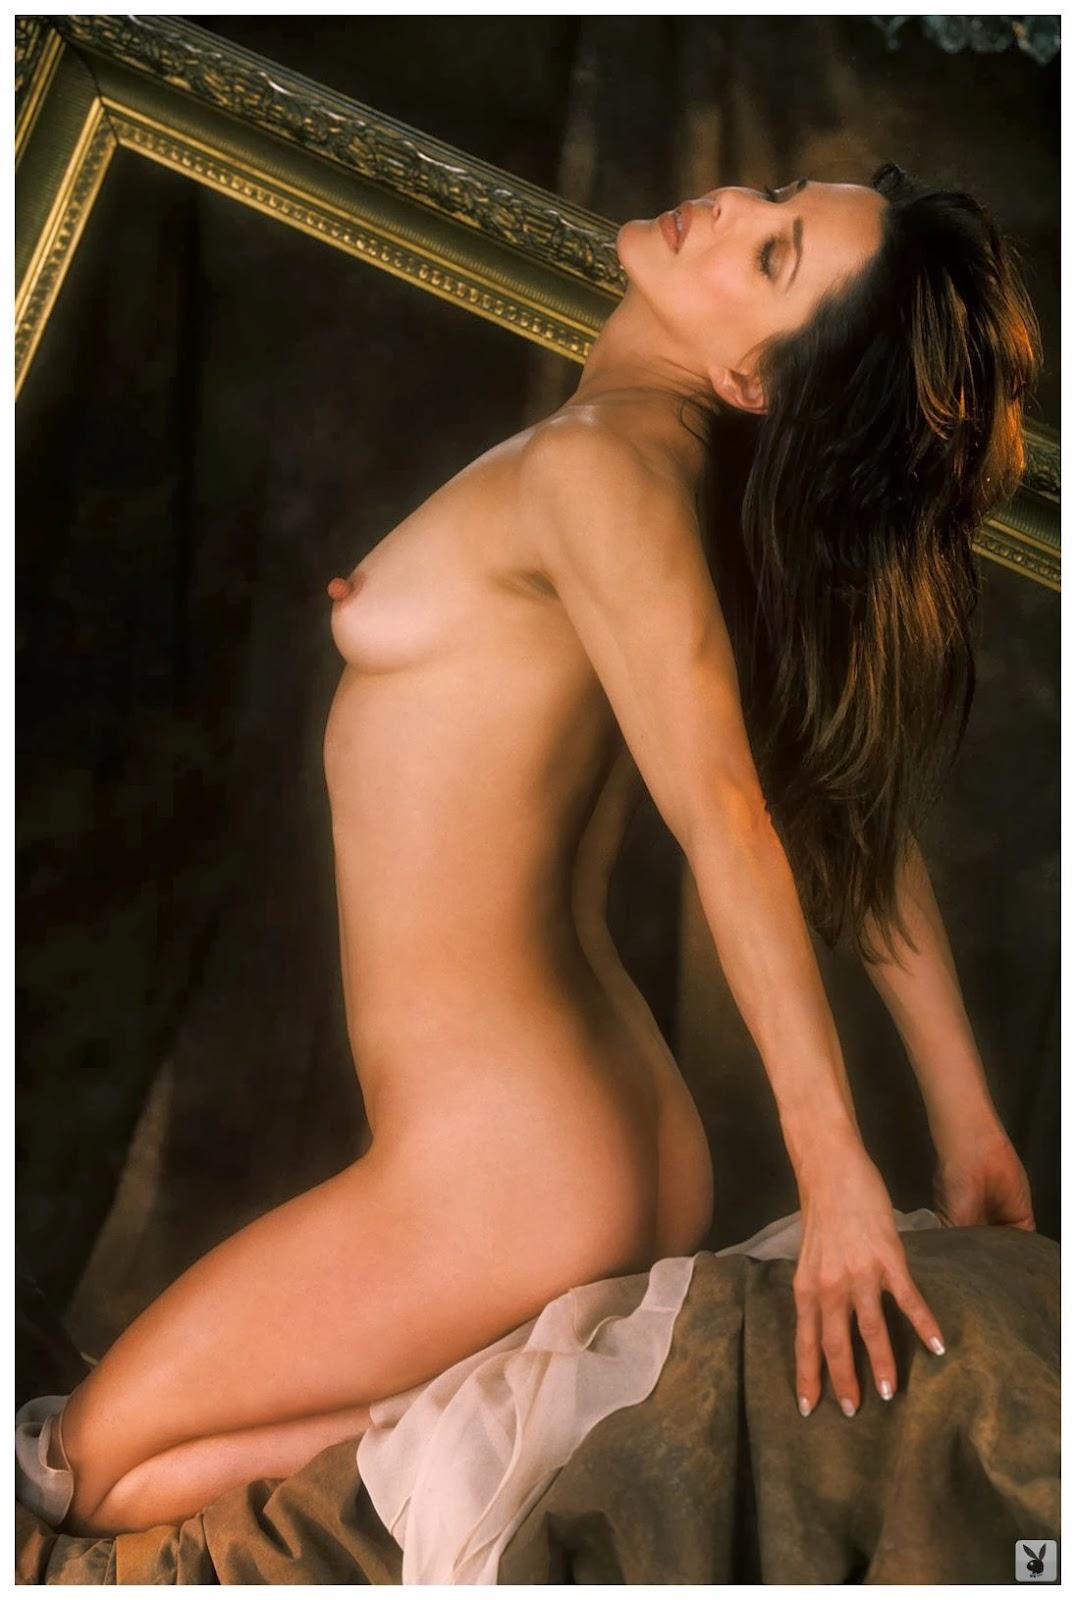 Topic Patti davis nude photos especial